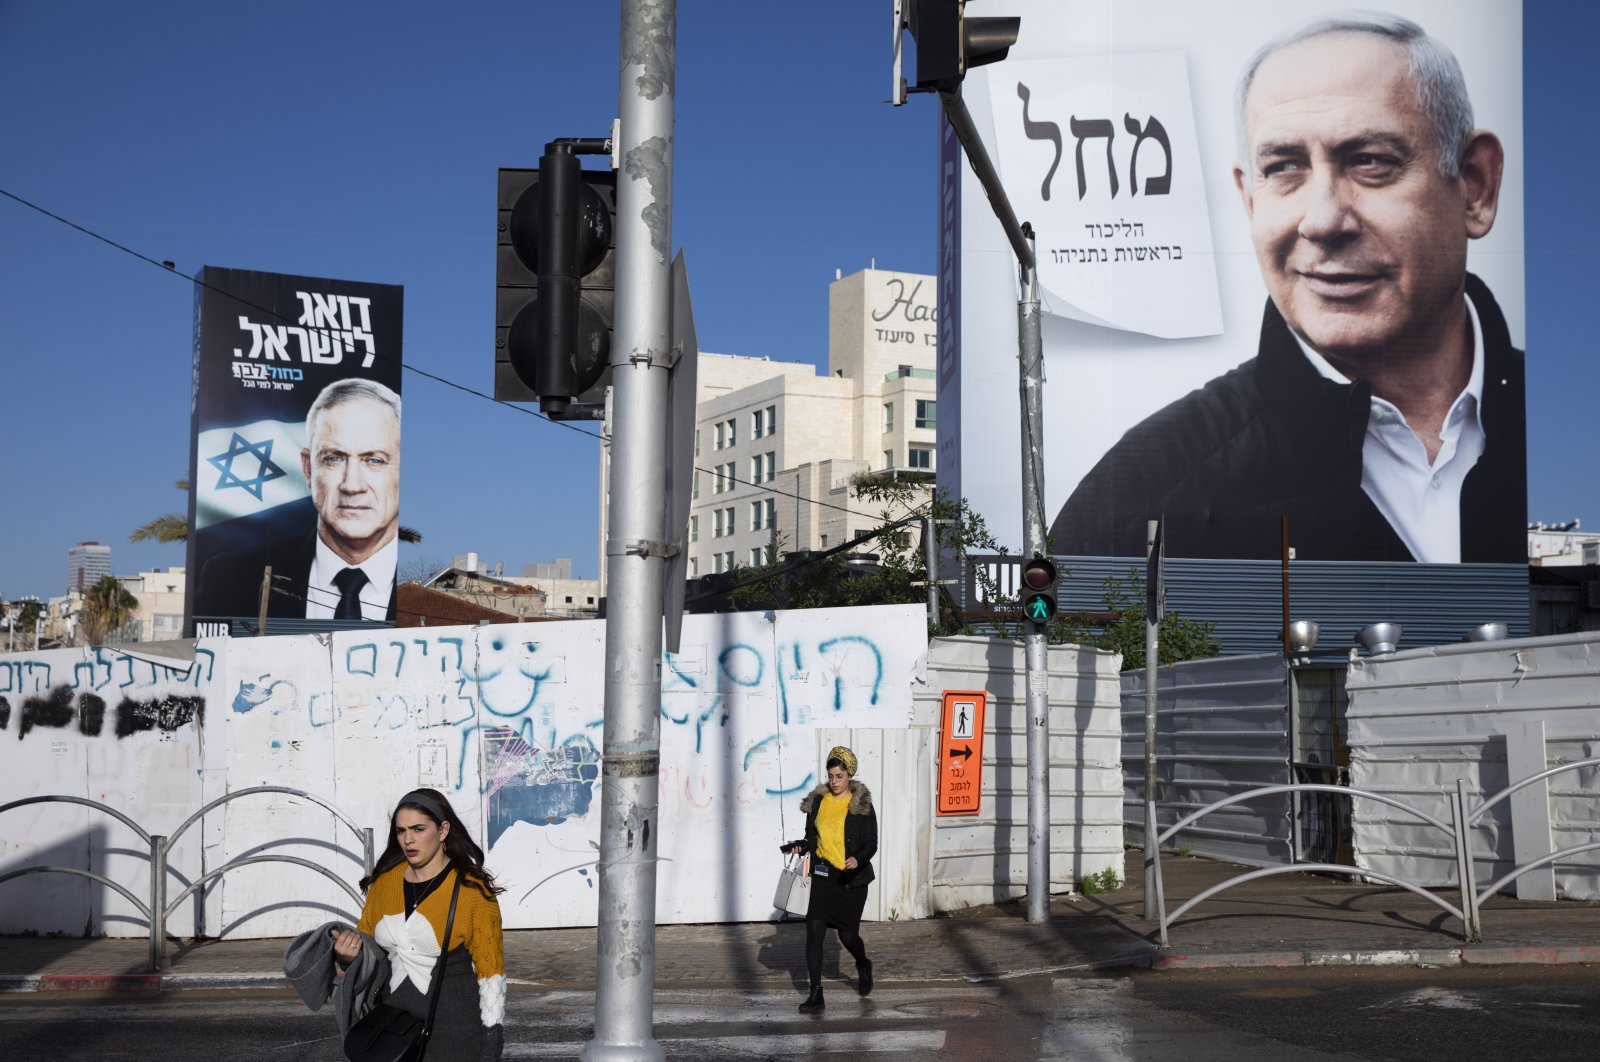 People walk next to election campaign billboards showing Israeli Prime Minister Benjamin Netanyahu (R) and Benny Gantz (L), Bnei Brak, March 1, 2020. (AP Photo)